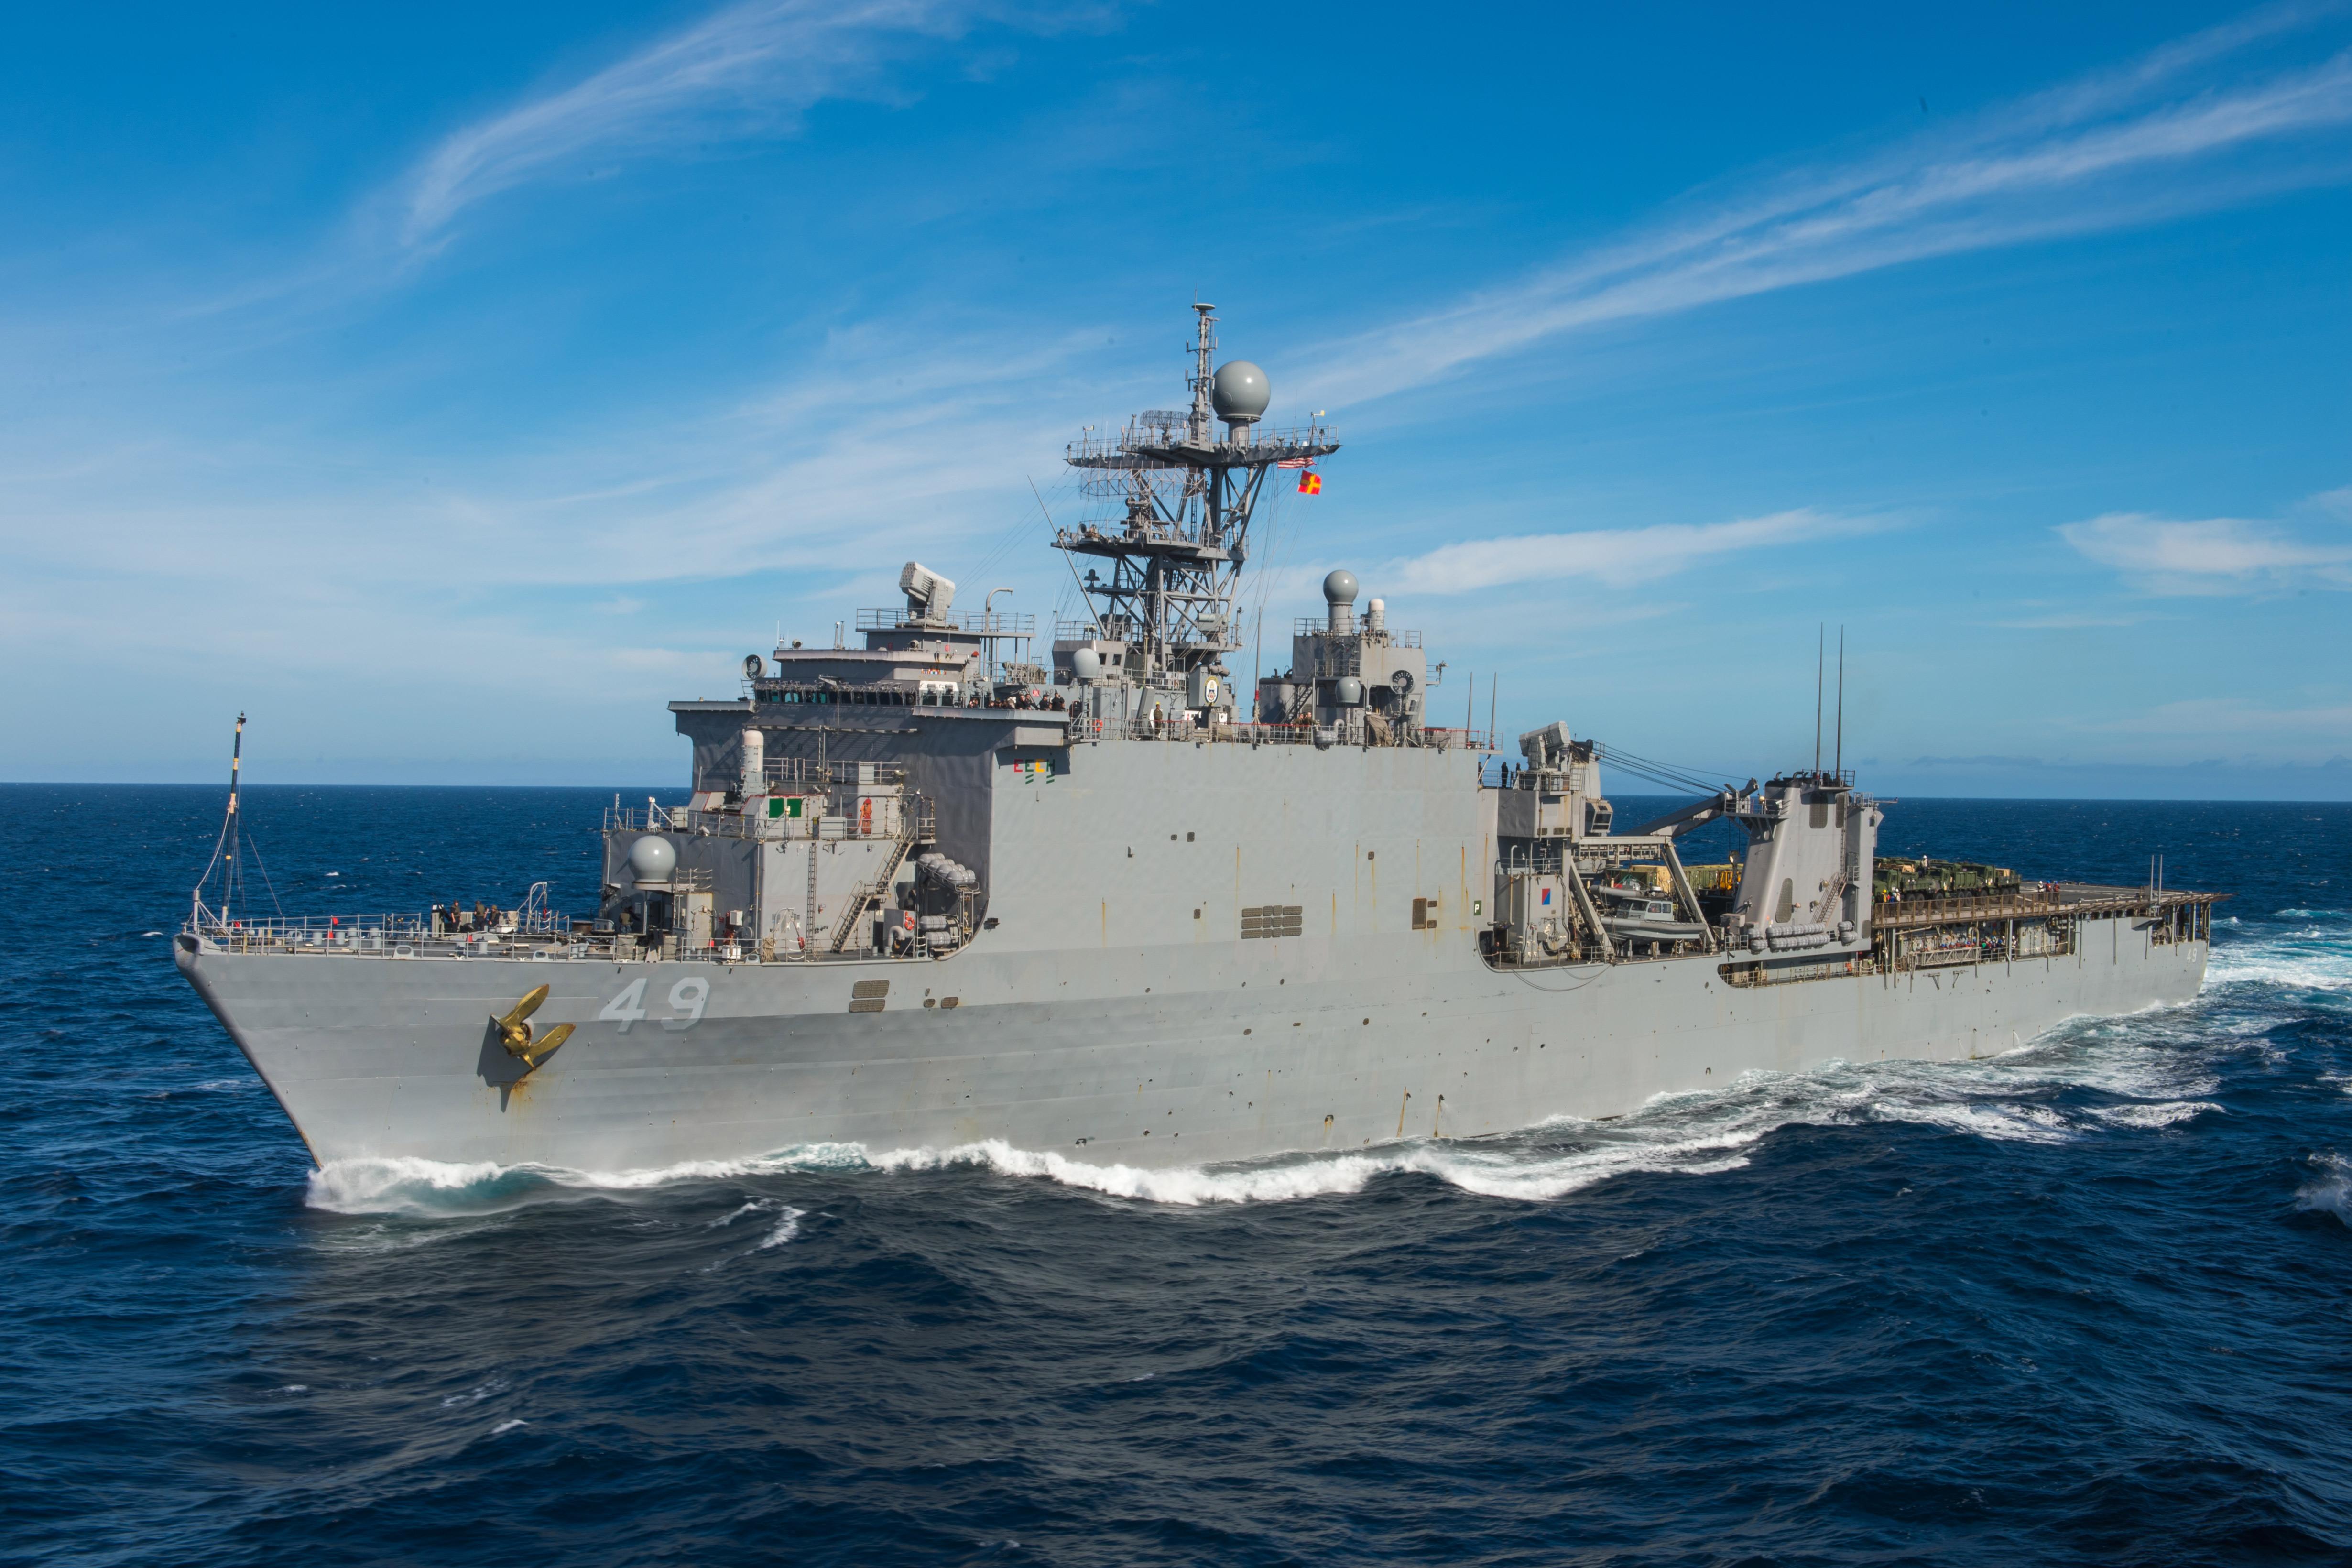 USS HARPERS FERRY LSD-49 am 10.12.2015 im Pazifik Bild: U.S. Navy